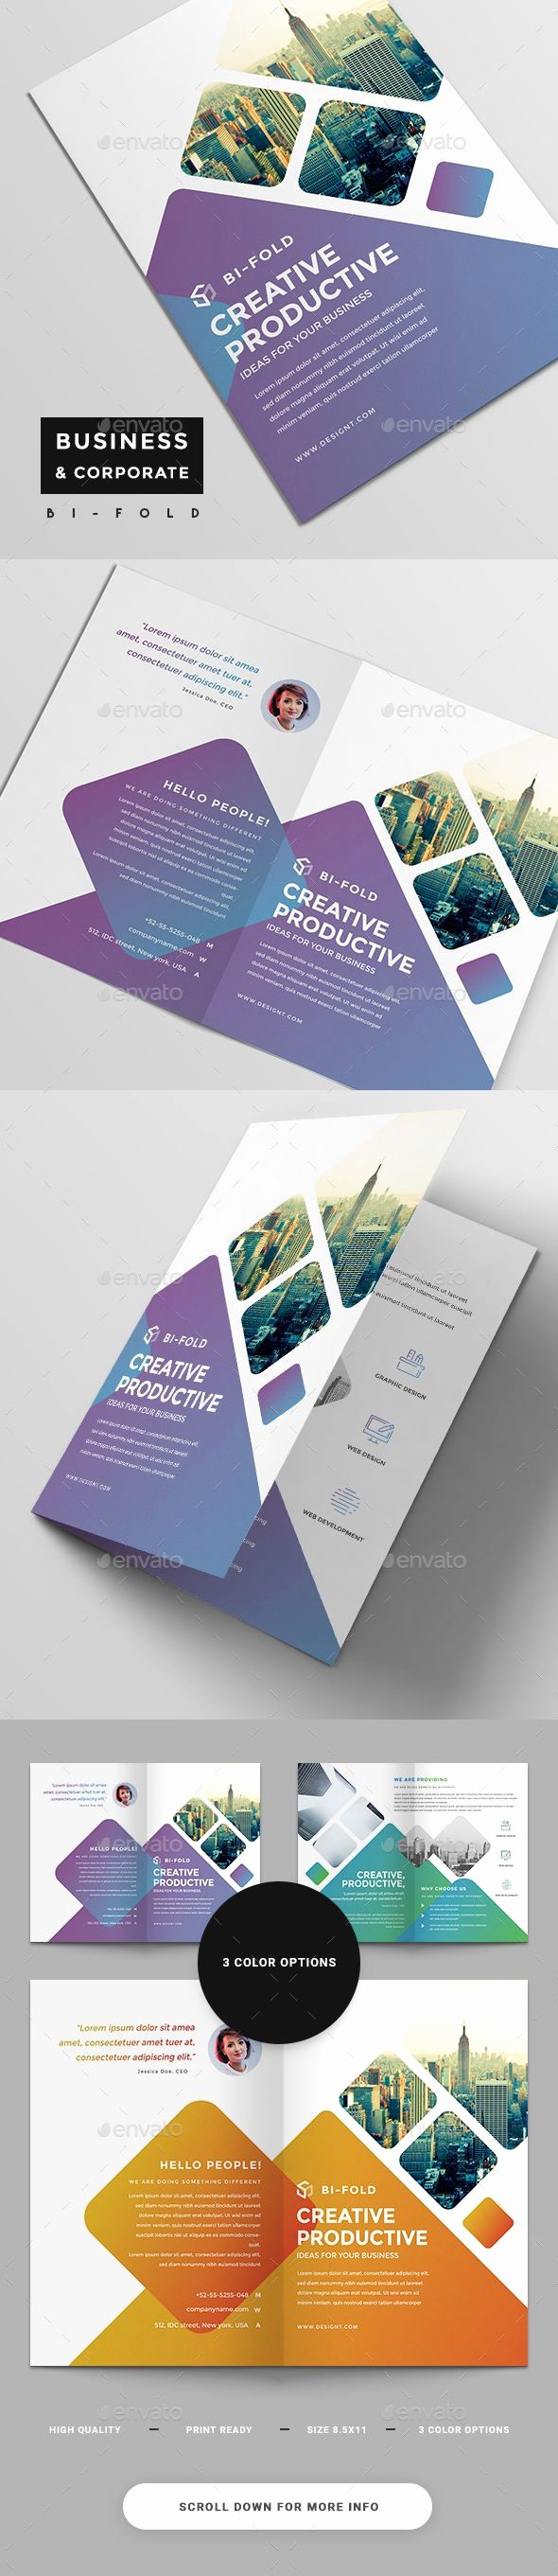 Bi-fold Brochure Template Beautiful 25 Best Ideas About Bi Fold Brochure On Pinterest